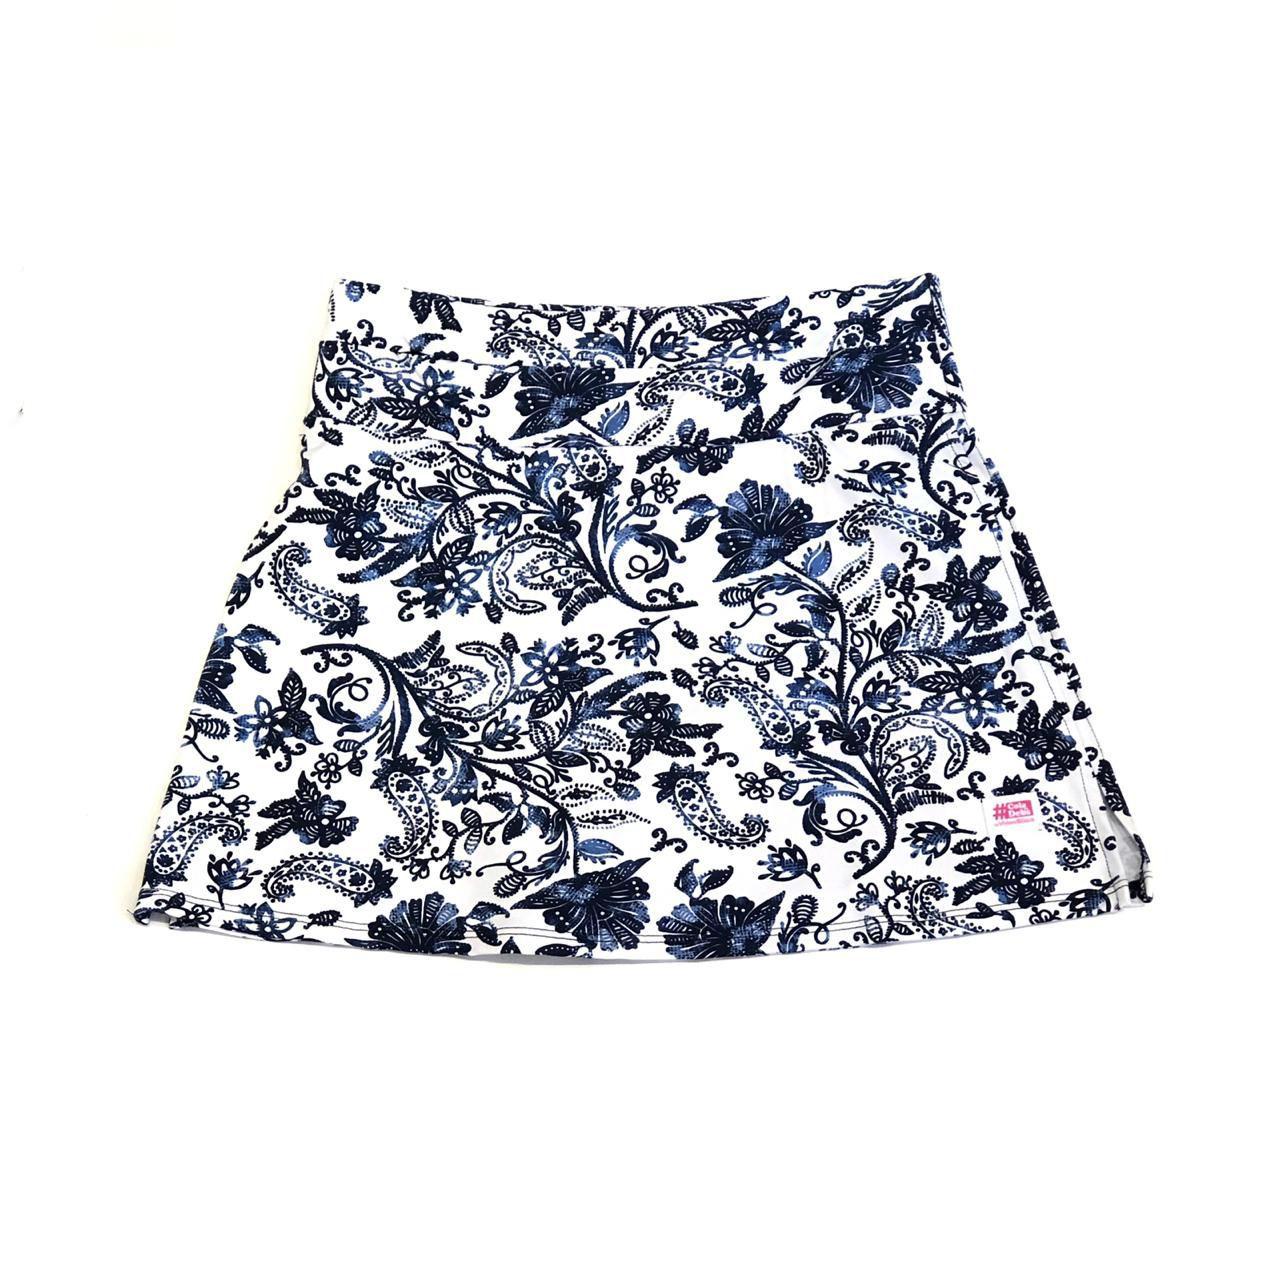 Saia Fitness 1500 bolsos estampa Floral Azul e Branco